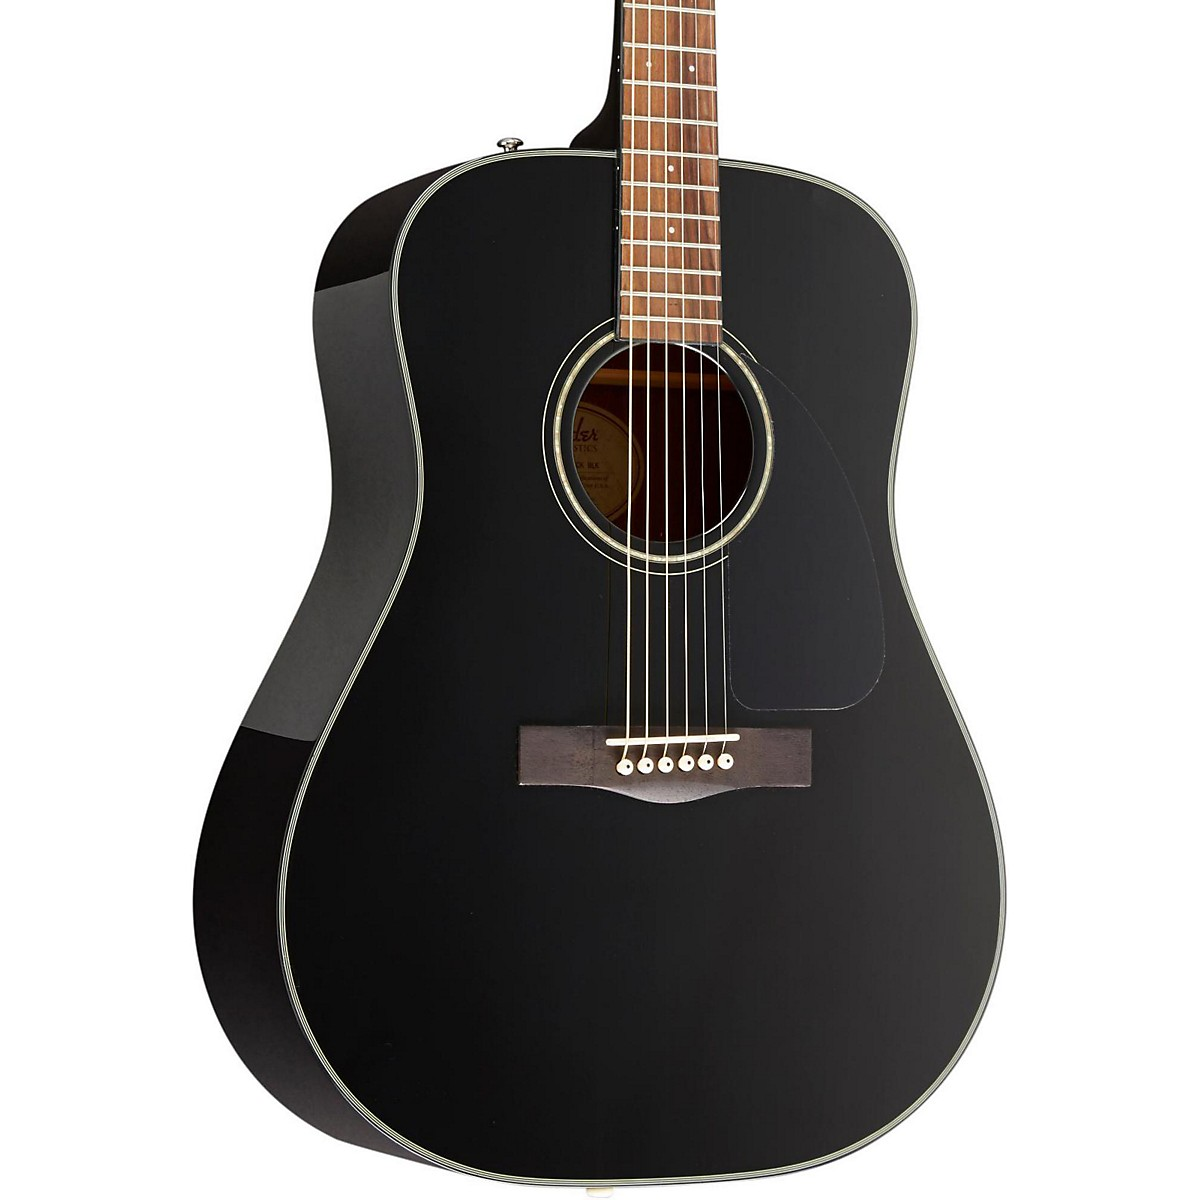 Fender DG-8S Dreadnought Acoustic Guitar Pack